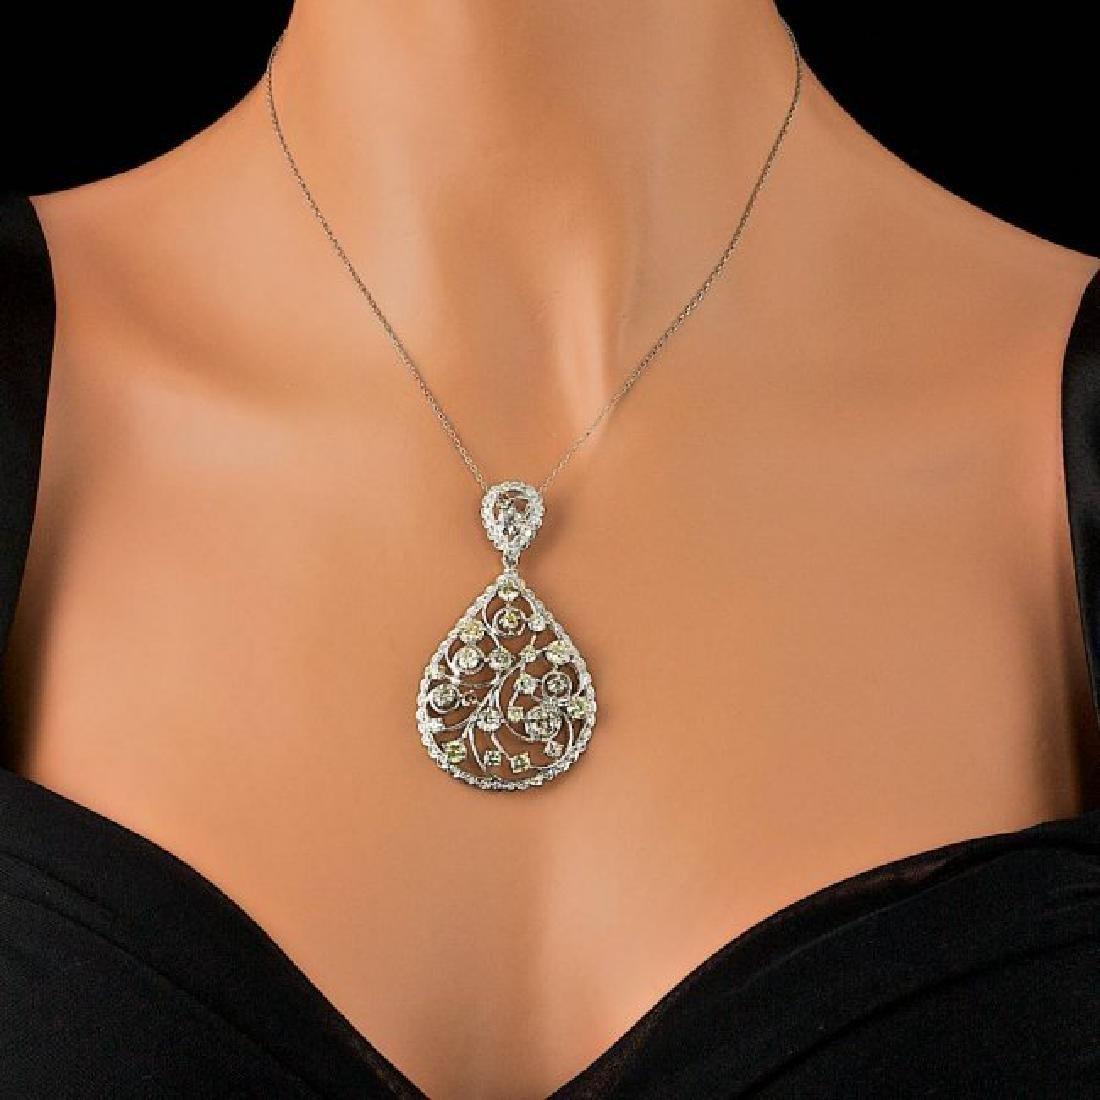 14k White Gold 6.85ct Diamond Pendant - 4